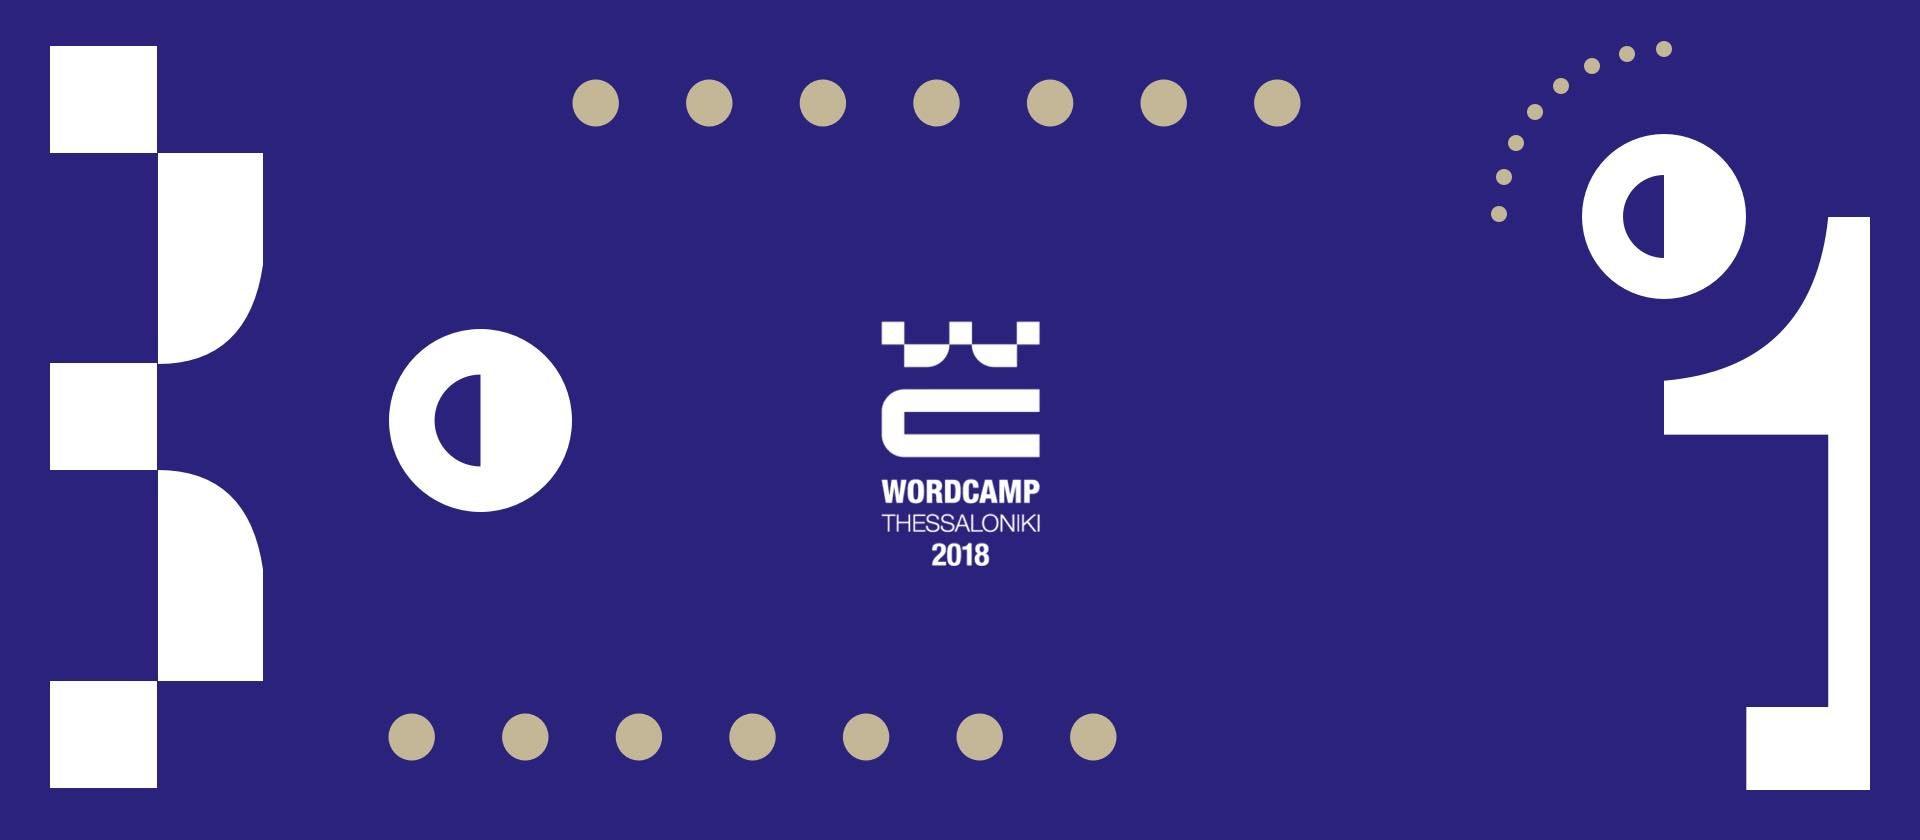 Wordcamp Thessaloniki 2018 Recap